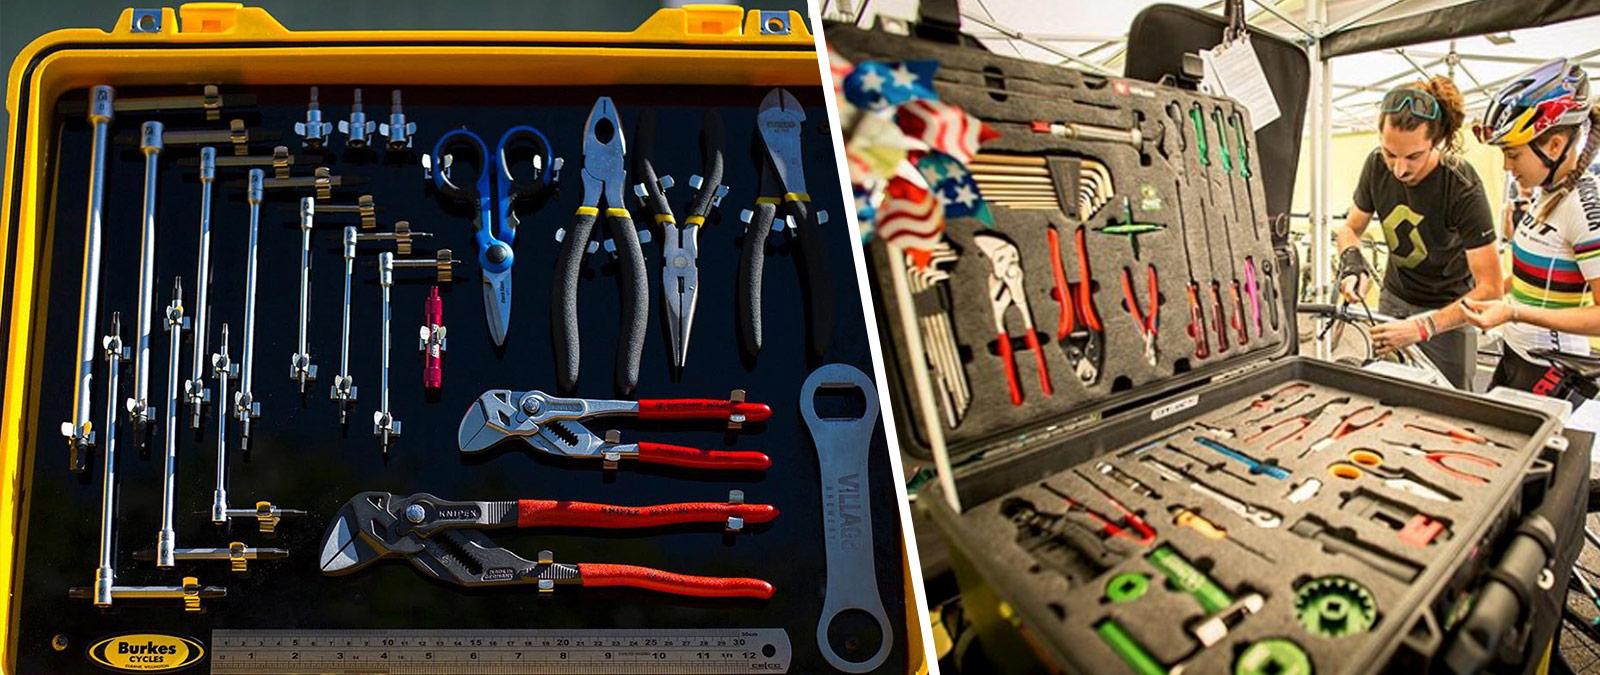 pelican professional blog storage foam tool box case